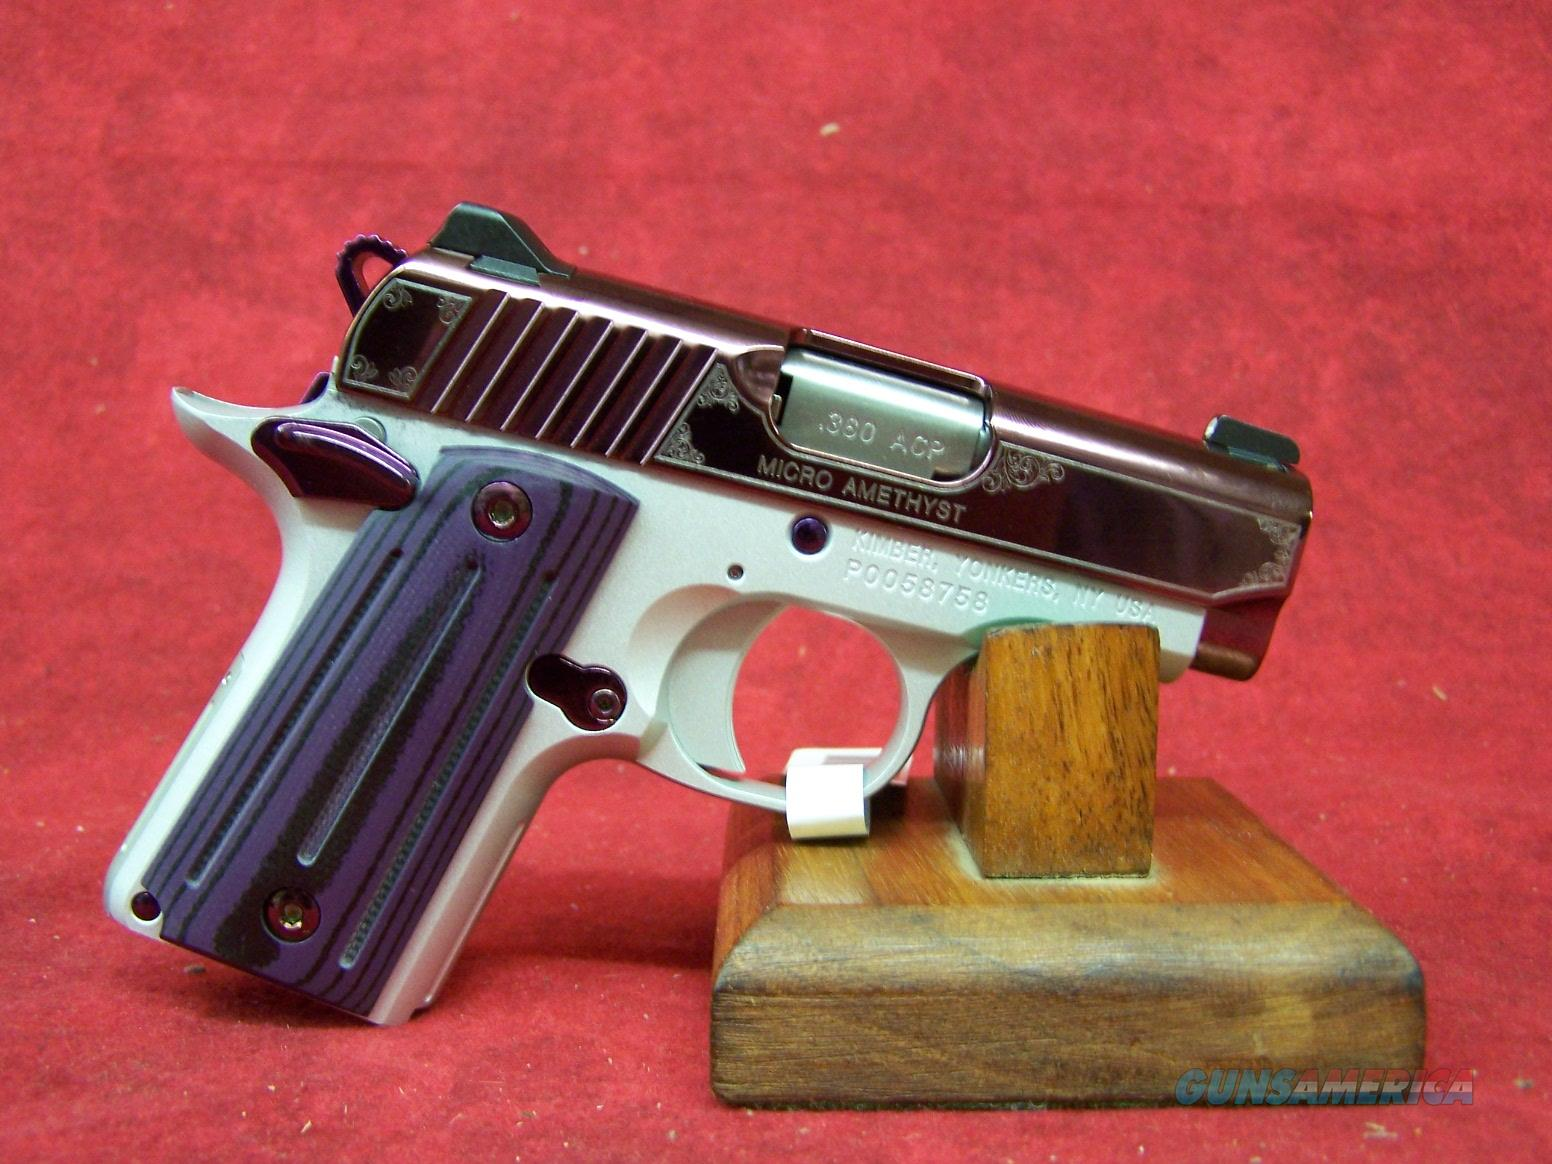 "Kimber Micro Amethyst .380 2.75"" Barrel (33160) Guns > Pistols >  Kimber of America Pistols > Micro"